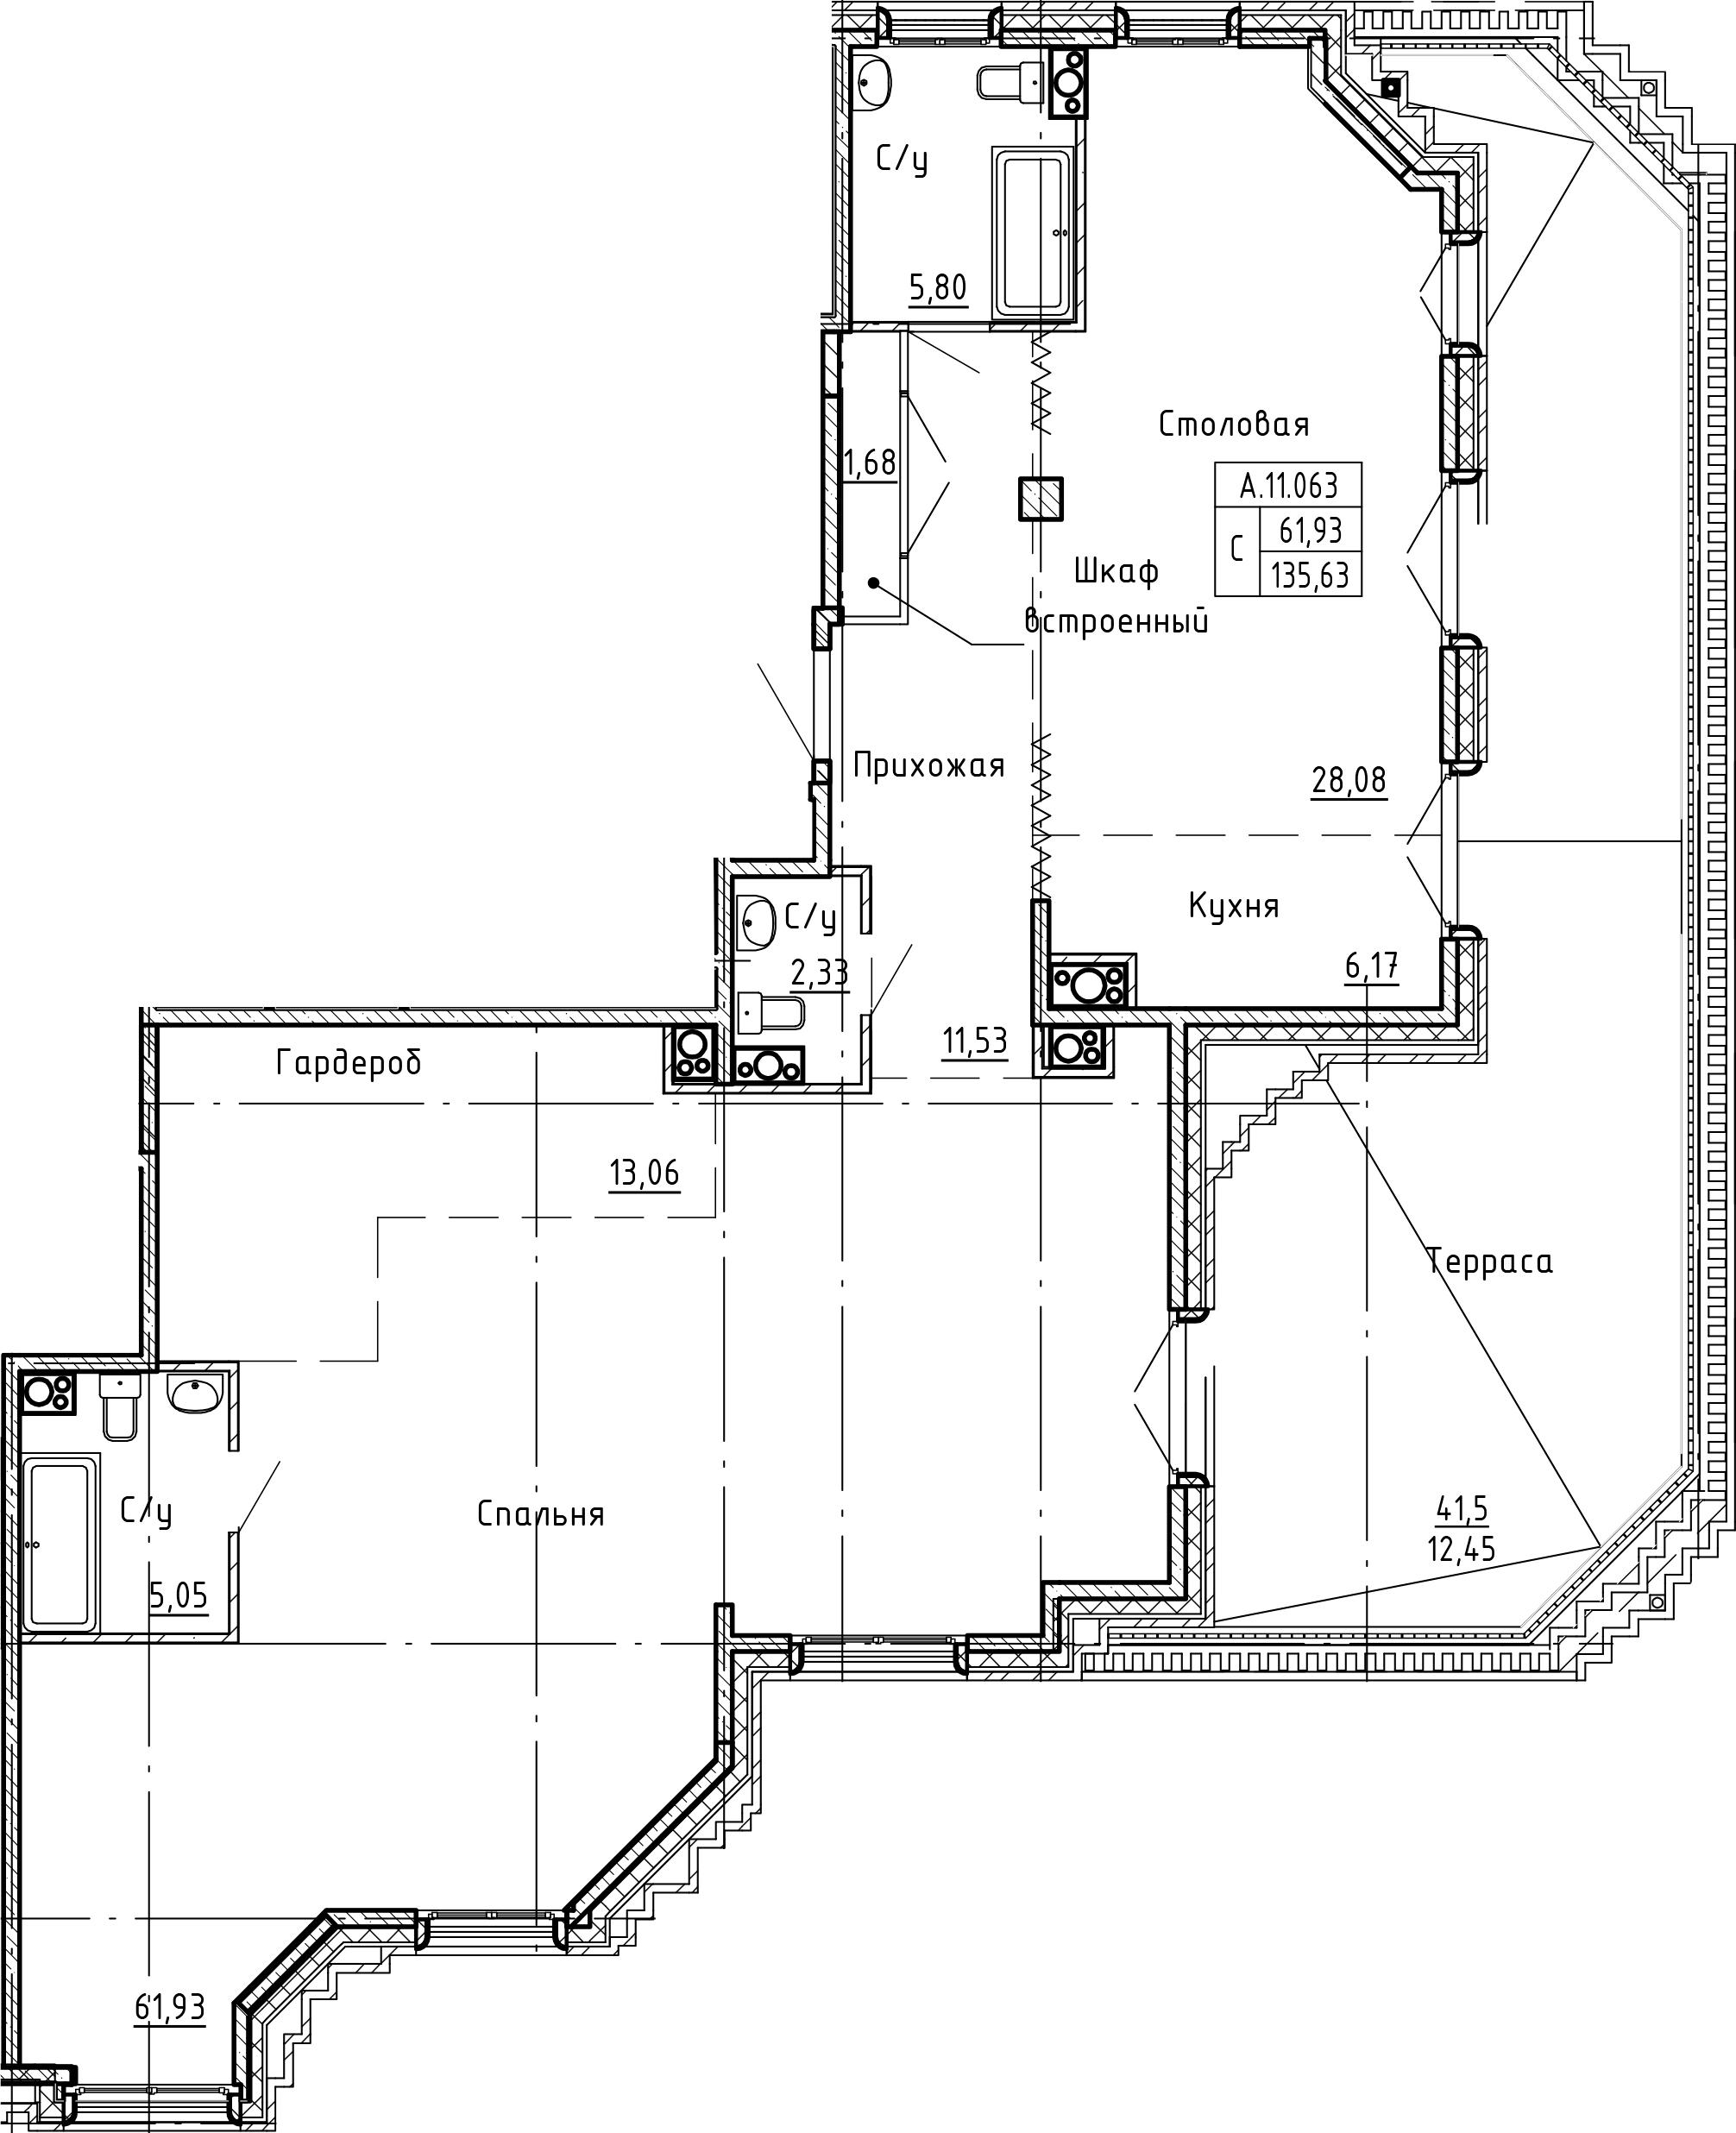 Студия 177 м<sup>2</sup> на 11 этаже